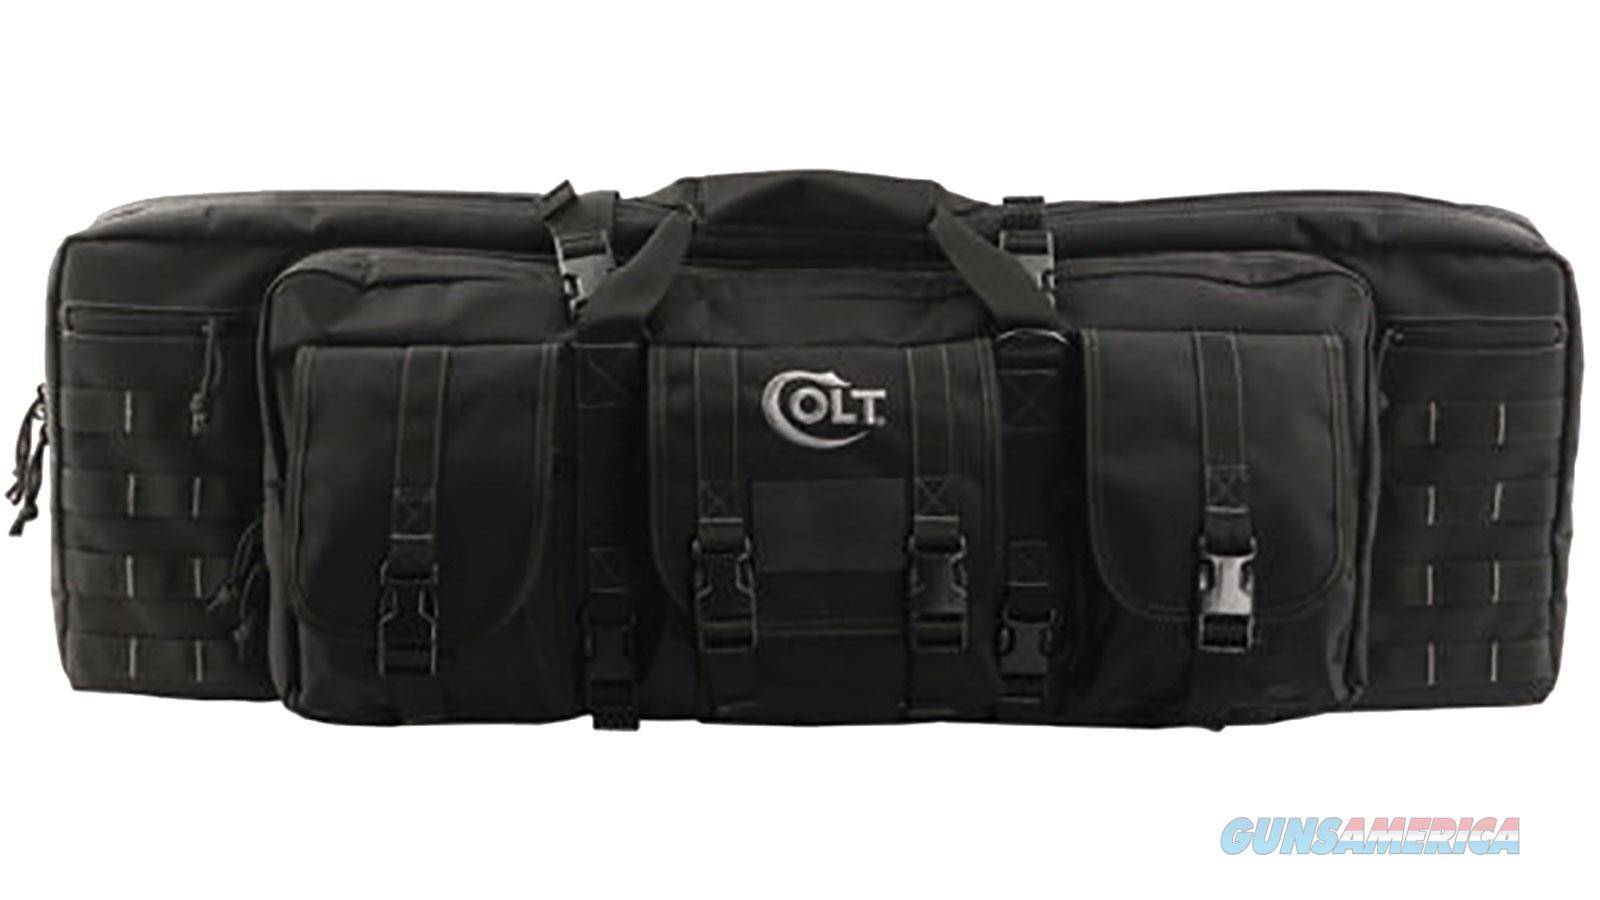 "Drago Gear Colt 36"" Double Gun Case Black C12-301BL  Non-Guns > Gun Cases"